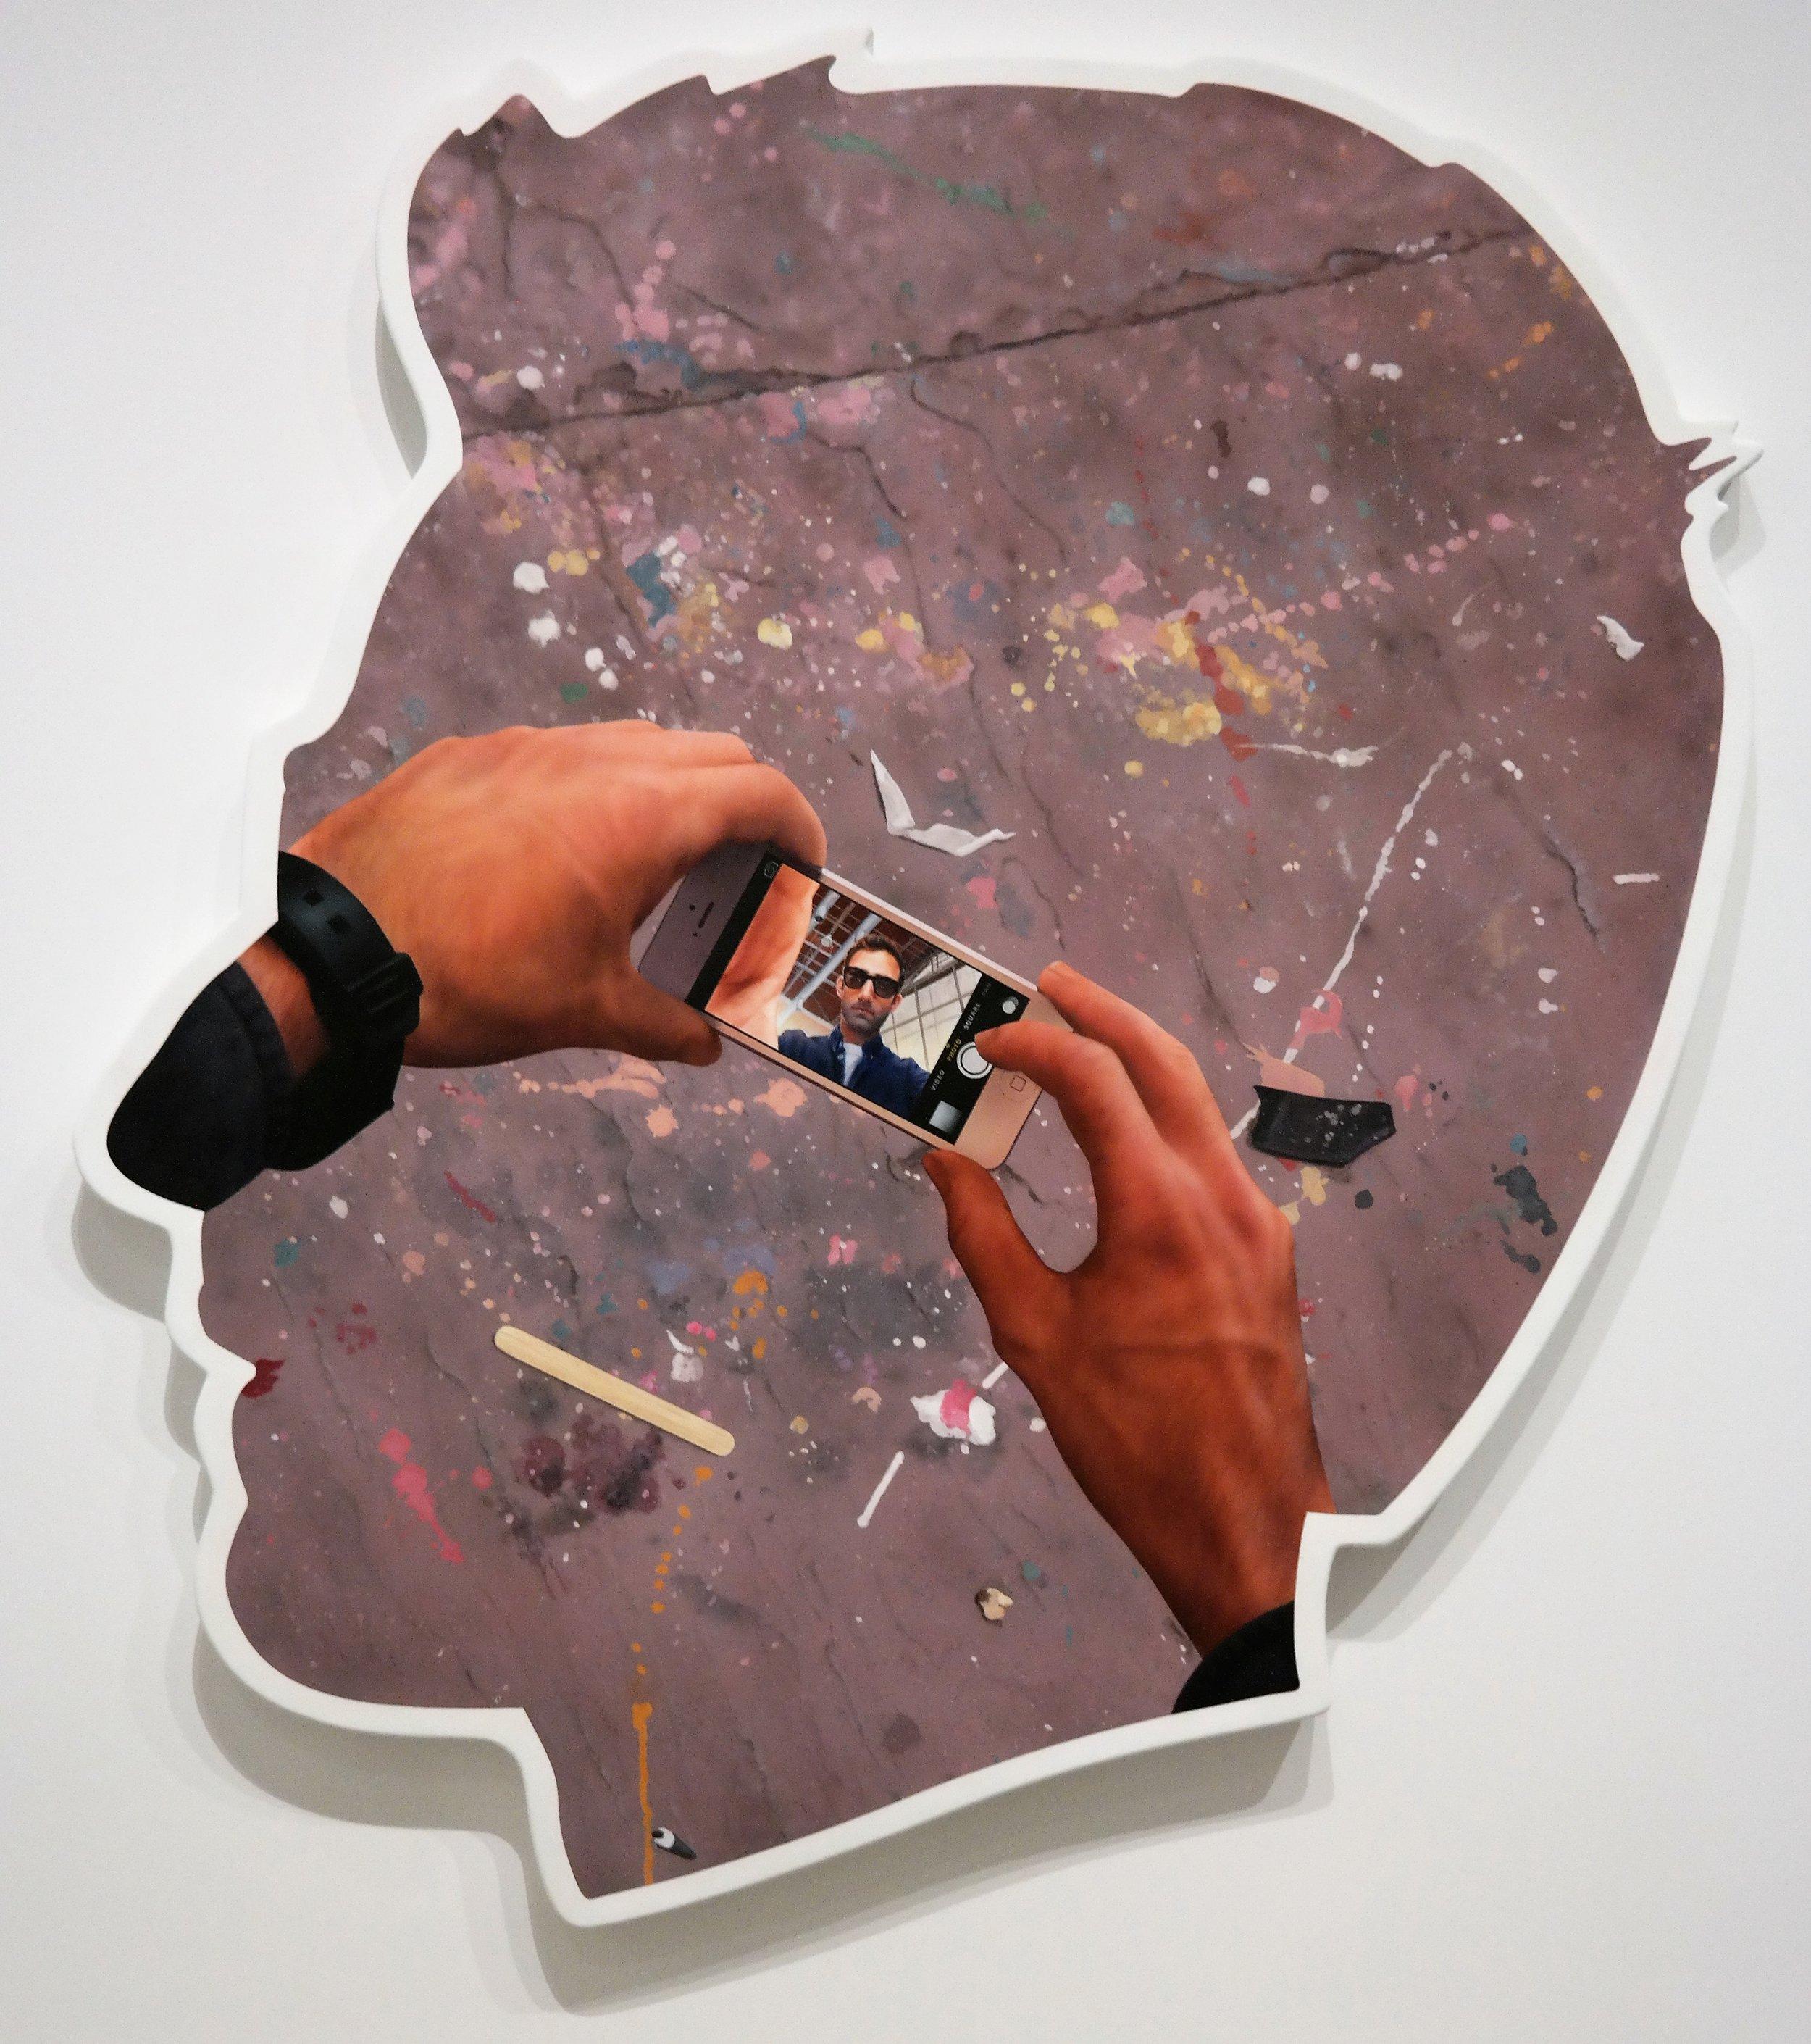 Self Portrait (Selfie and Studio Floor), Alex Israel, 2014